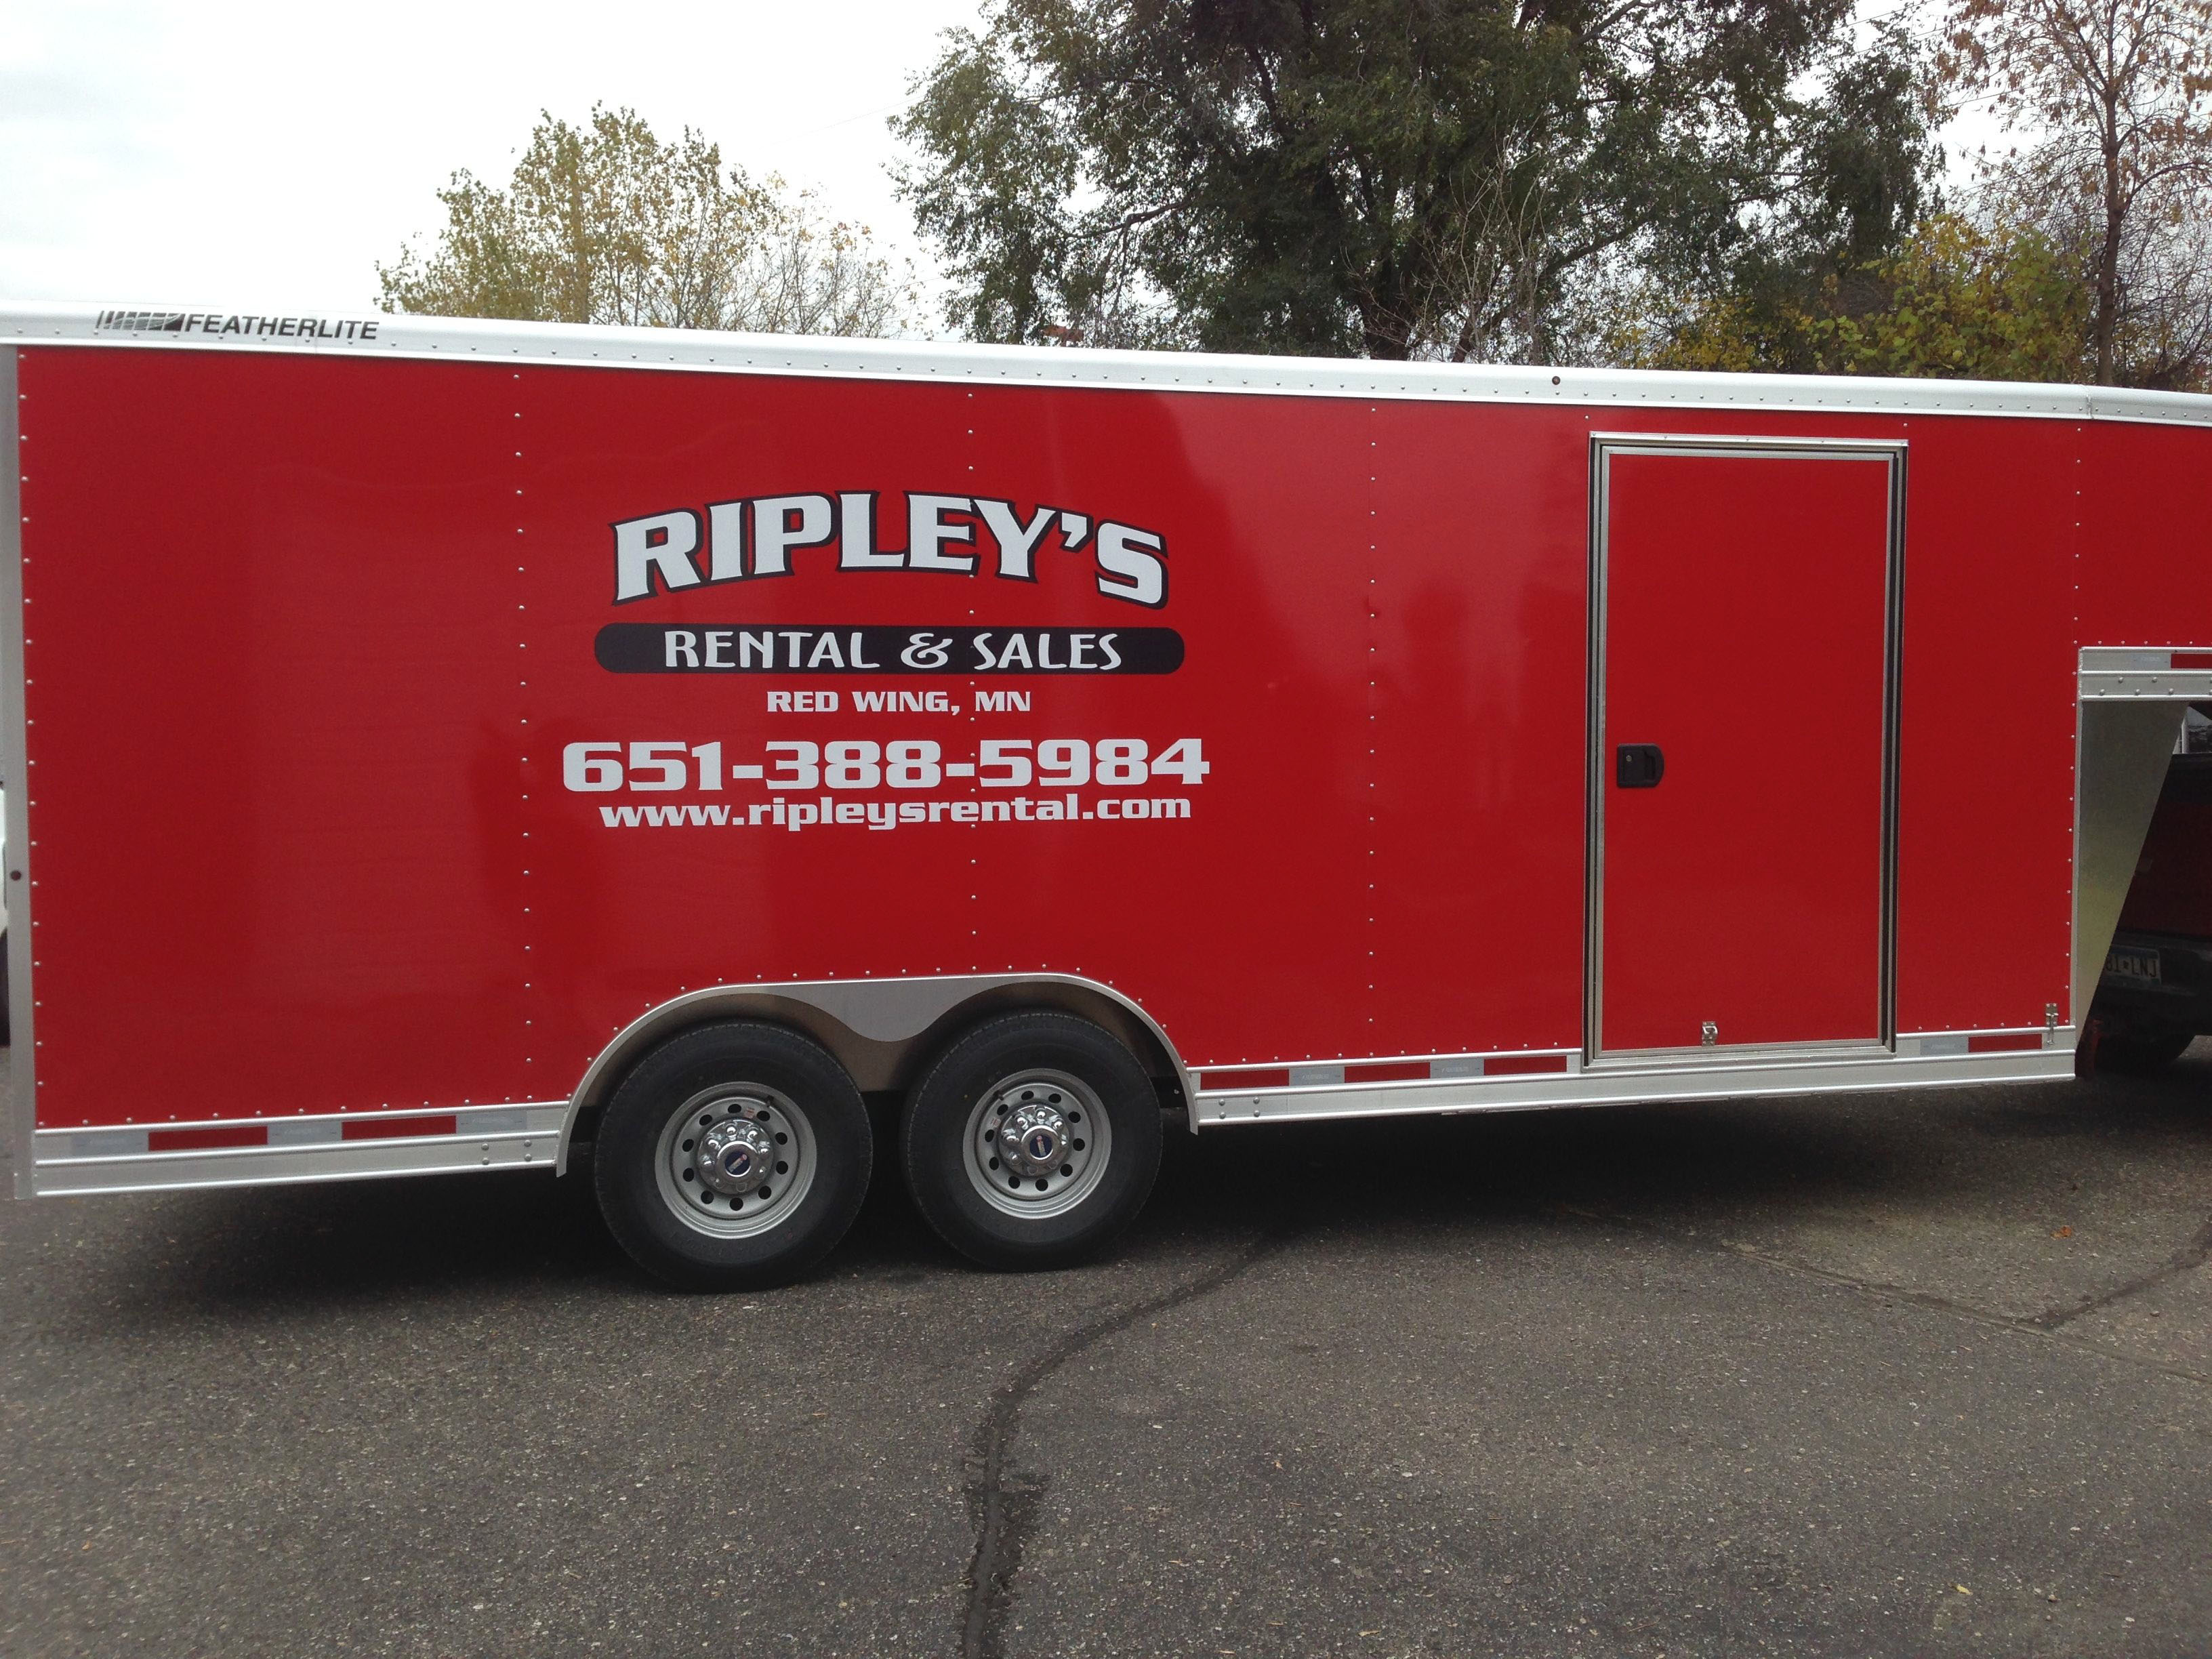 Ripley's Rental